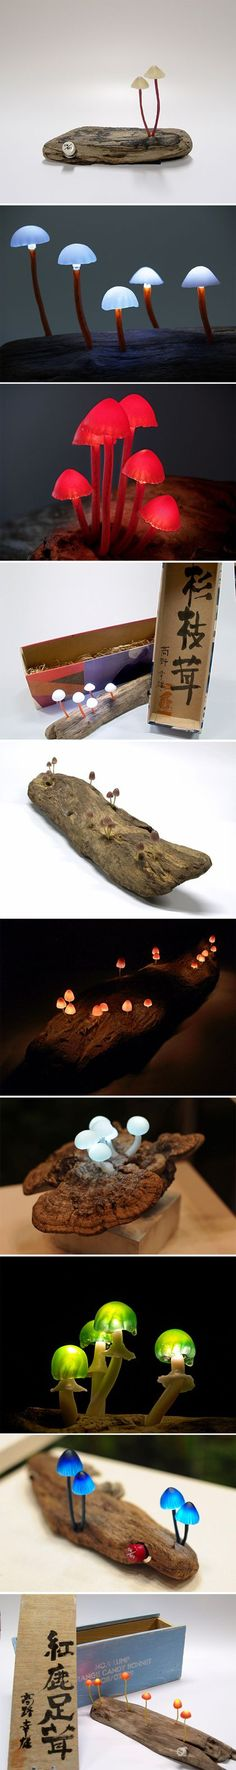 LED mushroom lights by Yukio Takano: